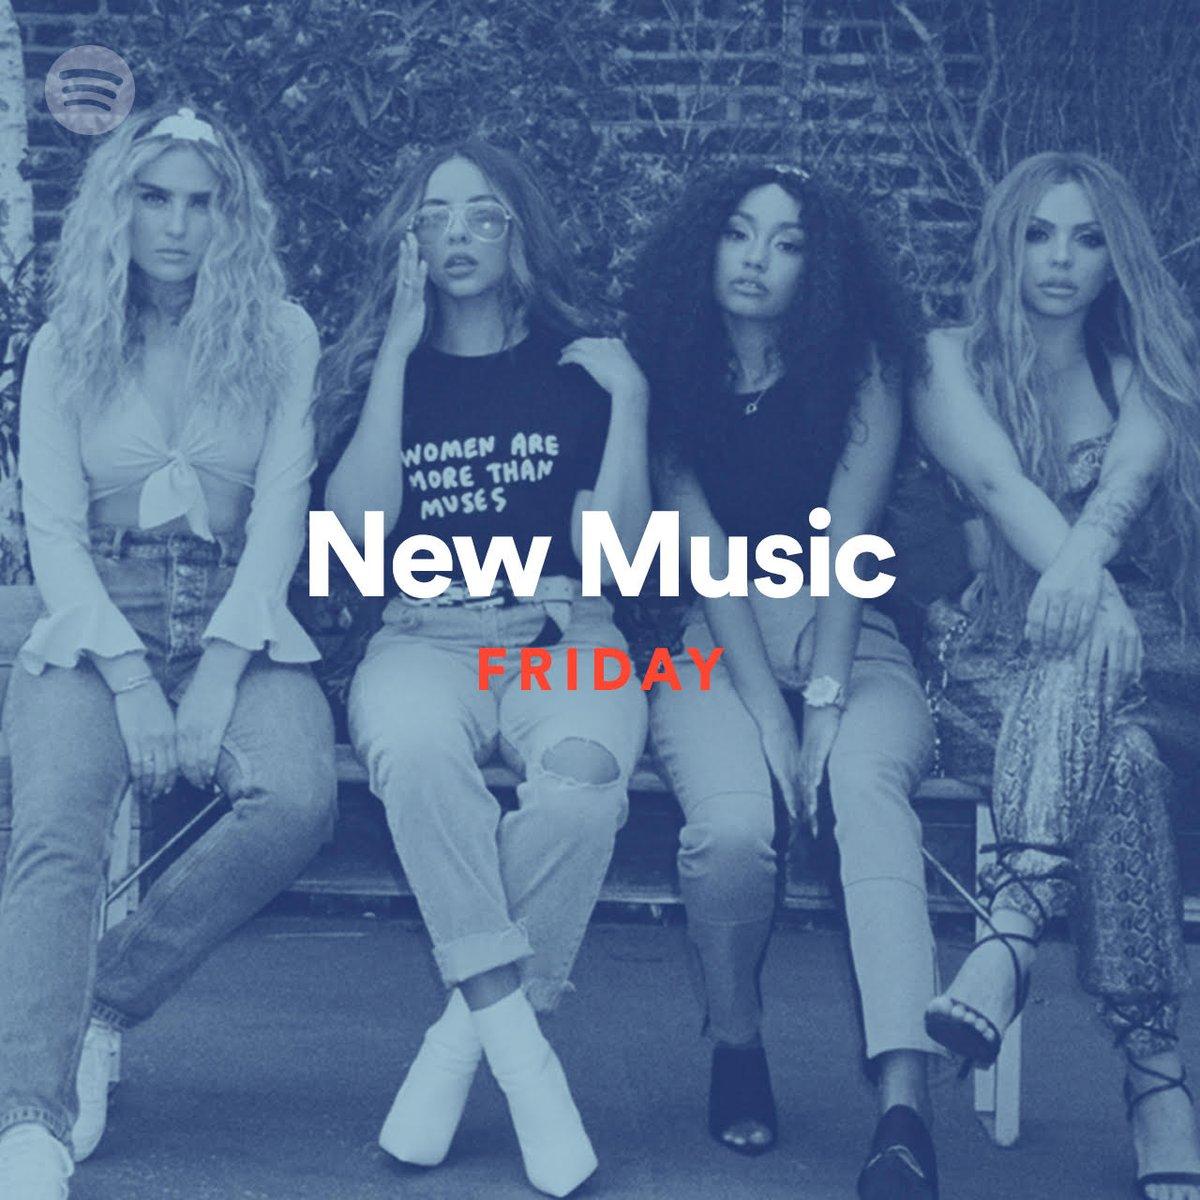 Say hello to #NewMusicFriday with @LittleMix   https:// spoti.fi/NMFSA  &nbsp;  <br>http://pic.twitter.com/4OTR0Rpw3y